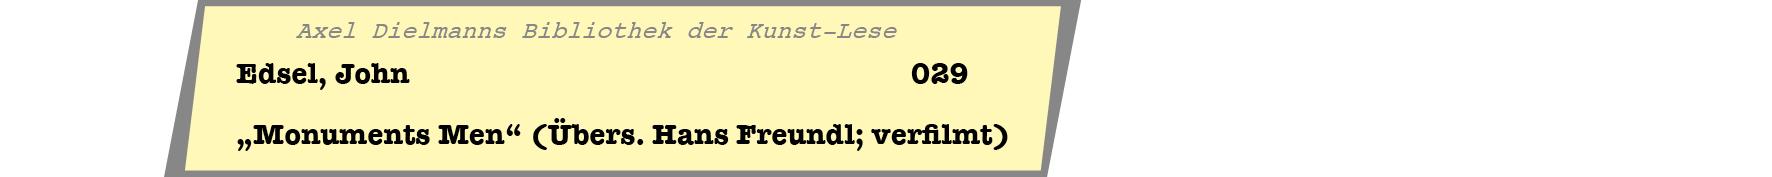 Kartei-33-Edsel